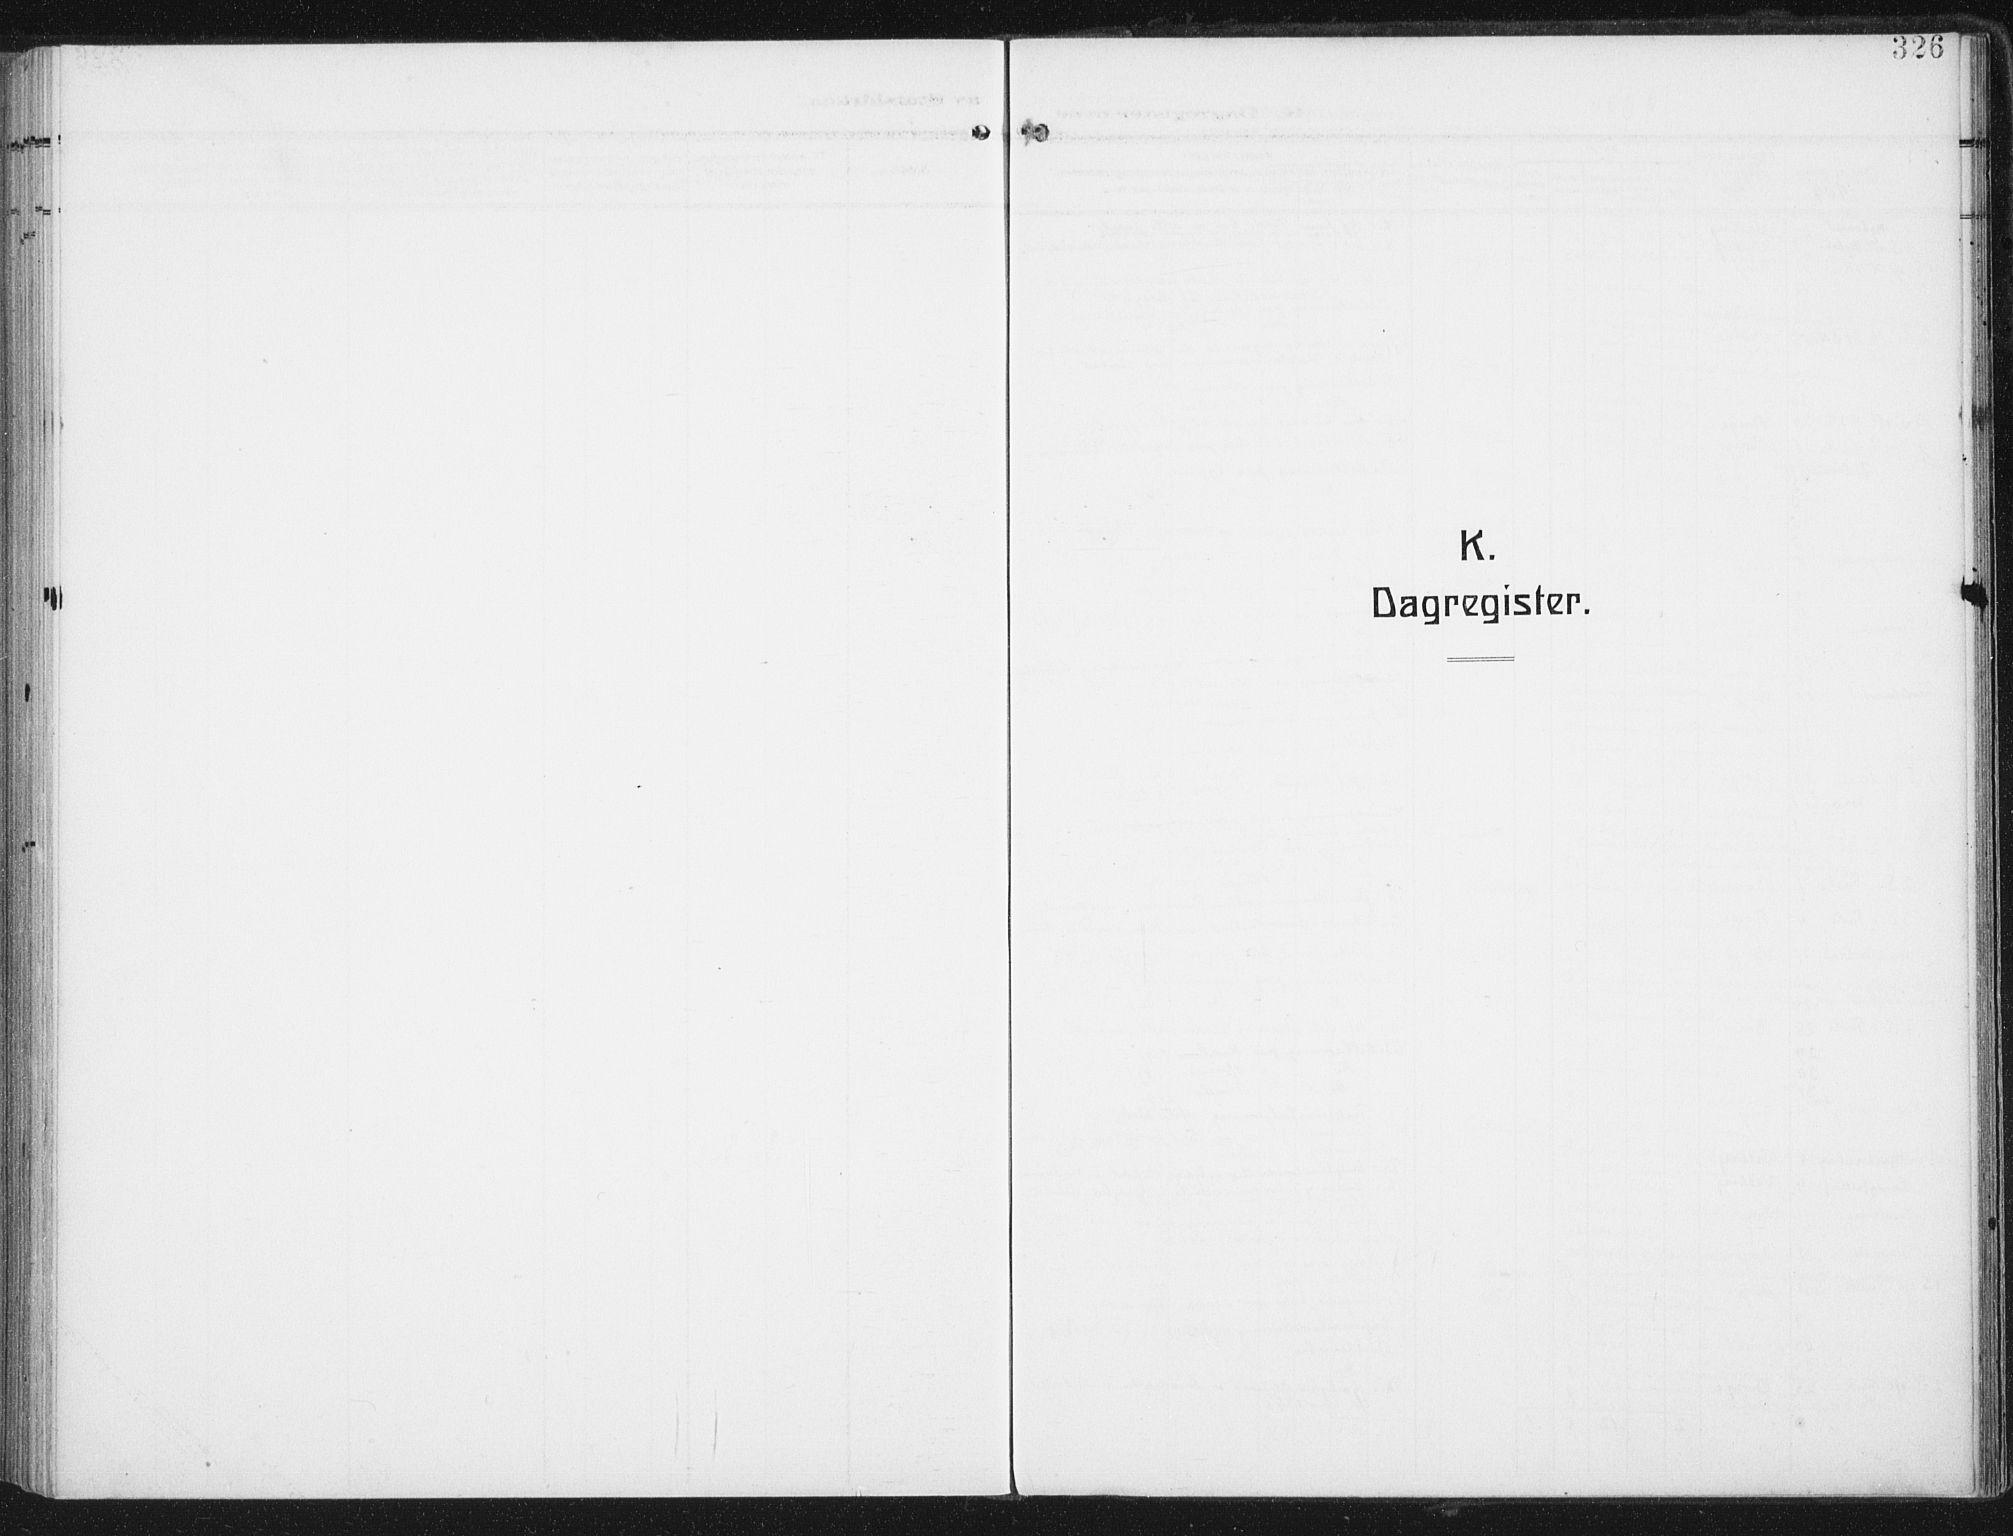 SAT, Ministerialprotokoller, klokkerbøker og fødselsregistre - Nordland, 880/L1135: Ministerialbok nr. 880A09, 1908-1919, s. 326